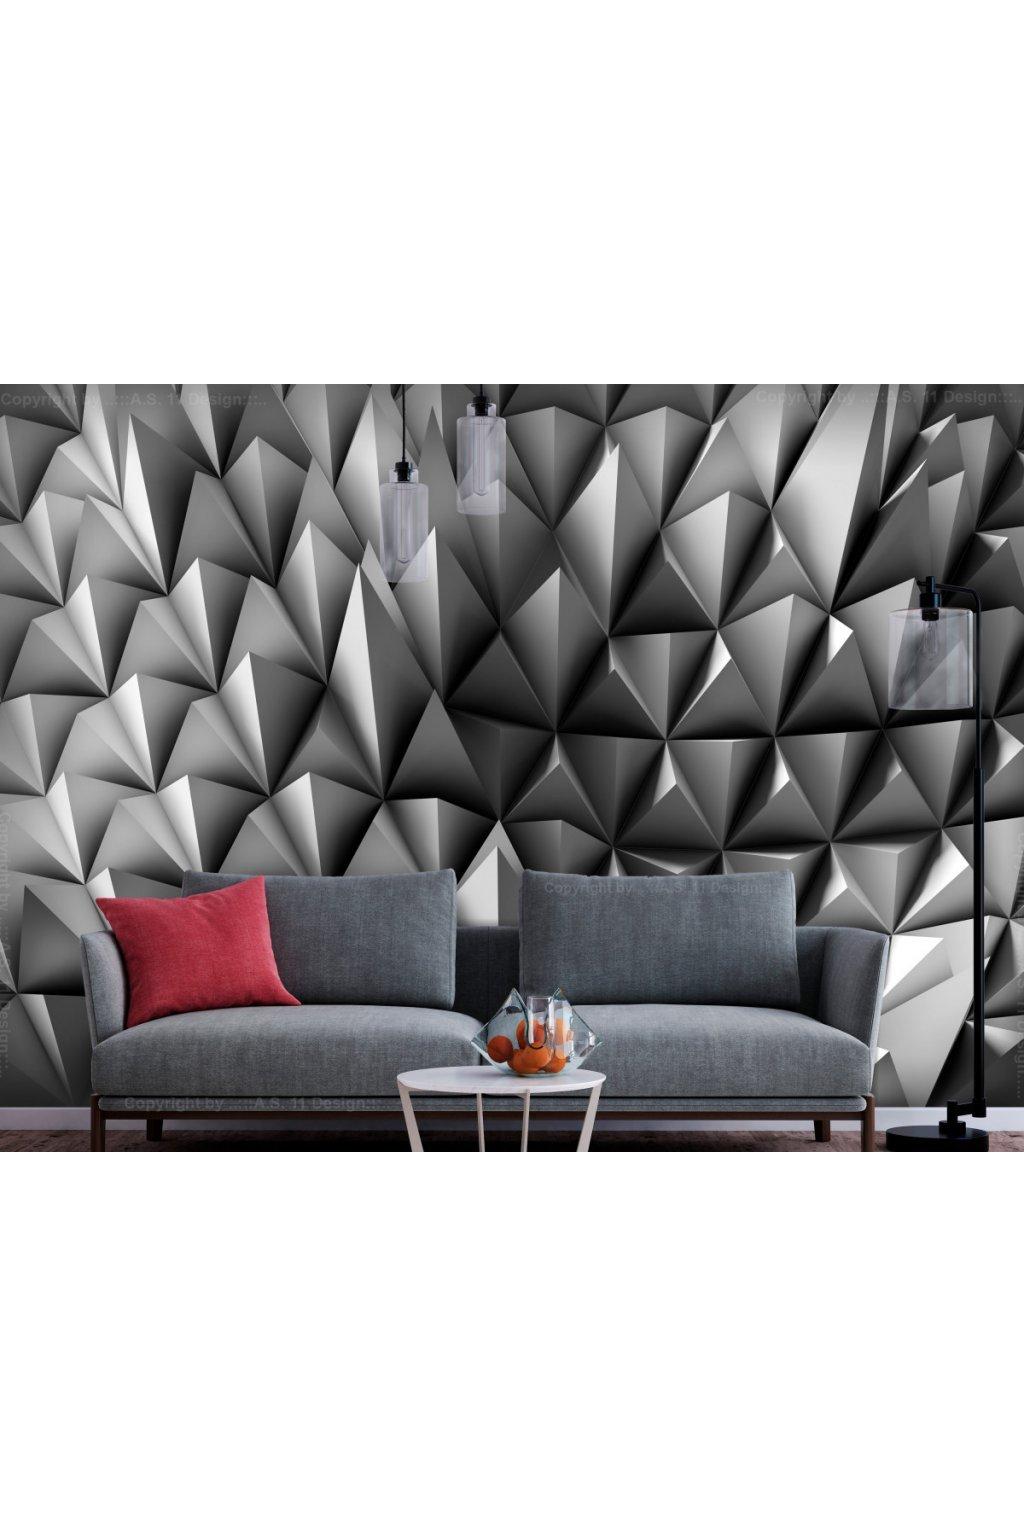 Murando DeLuxe 3D tapeta ocelové hroty  - zvìtšit obrázek